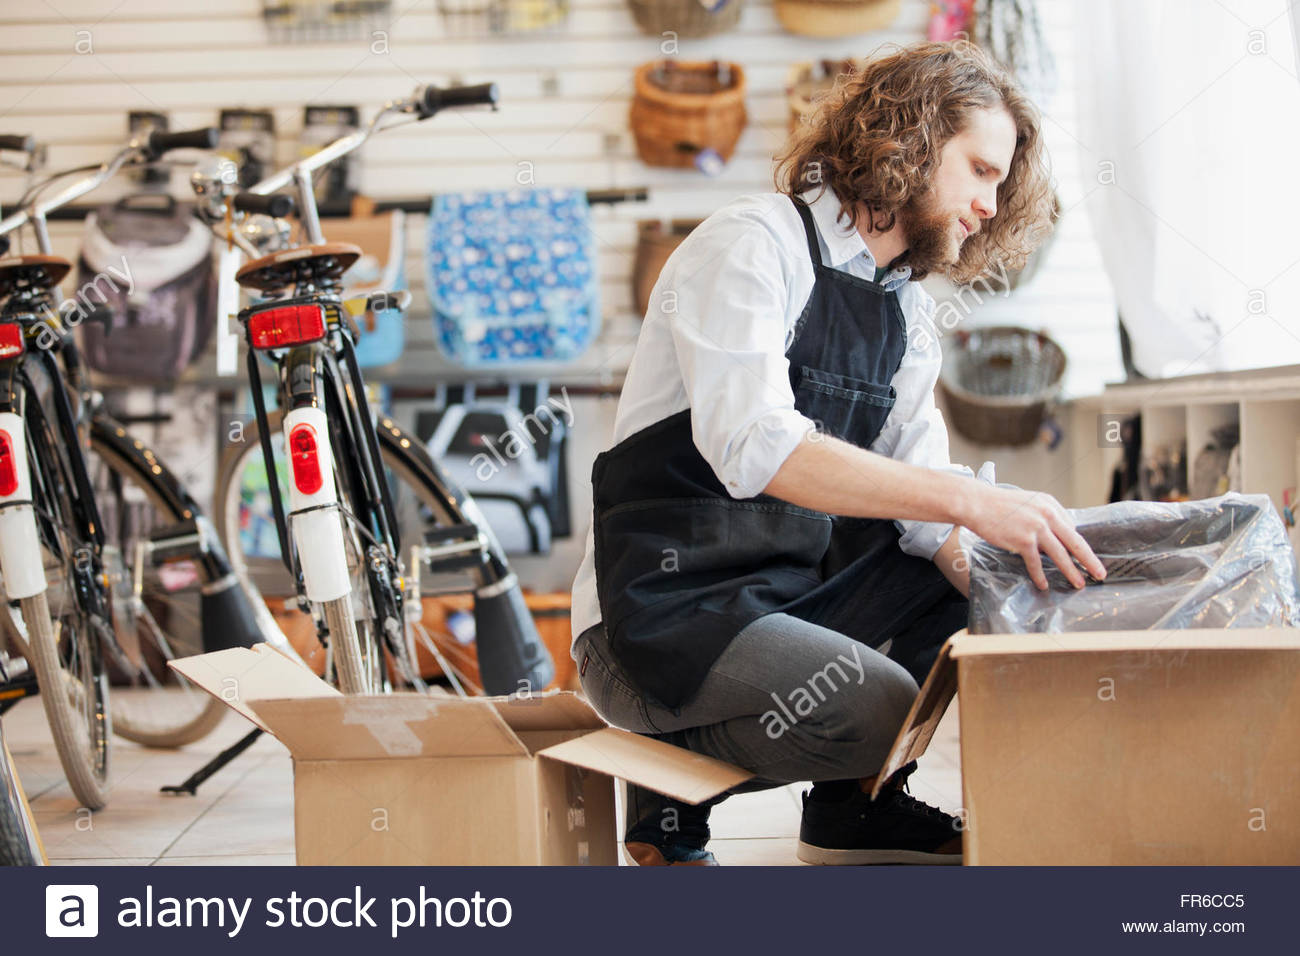 bike shop owner unpacking boxes - Stock Image